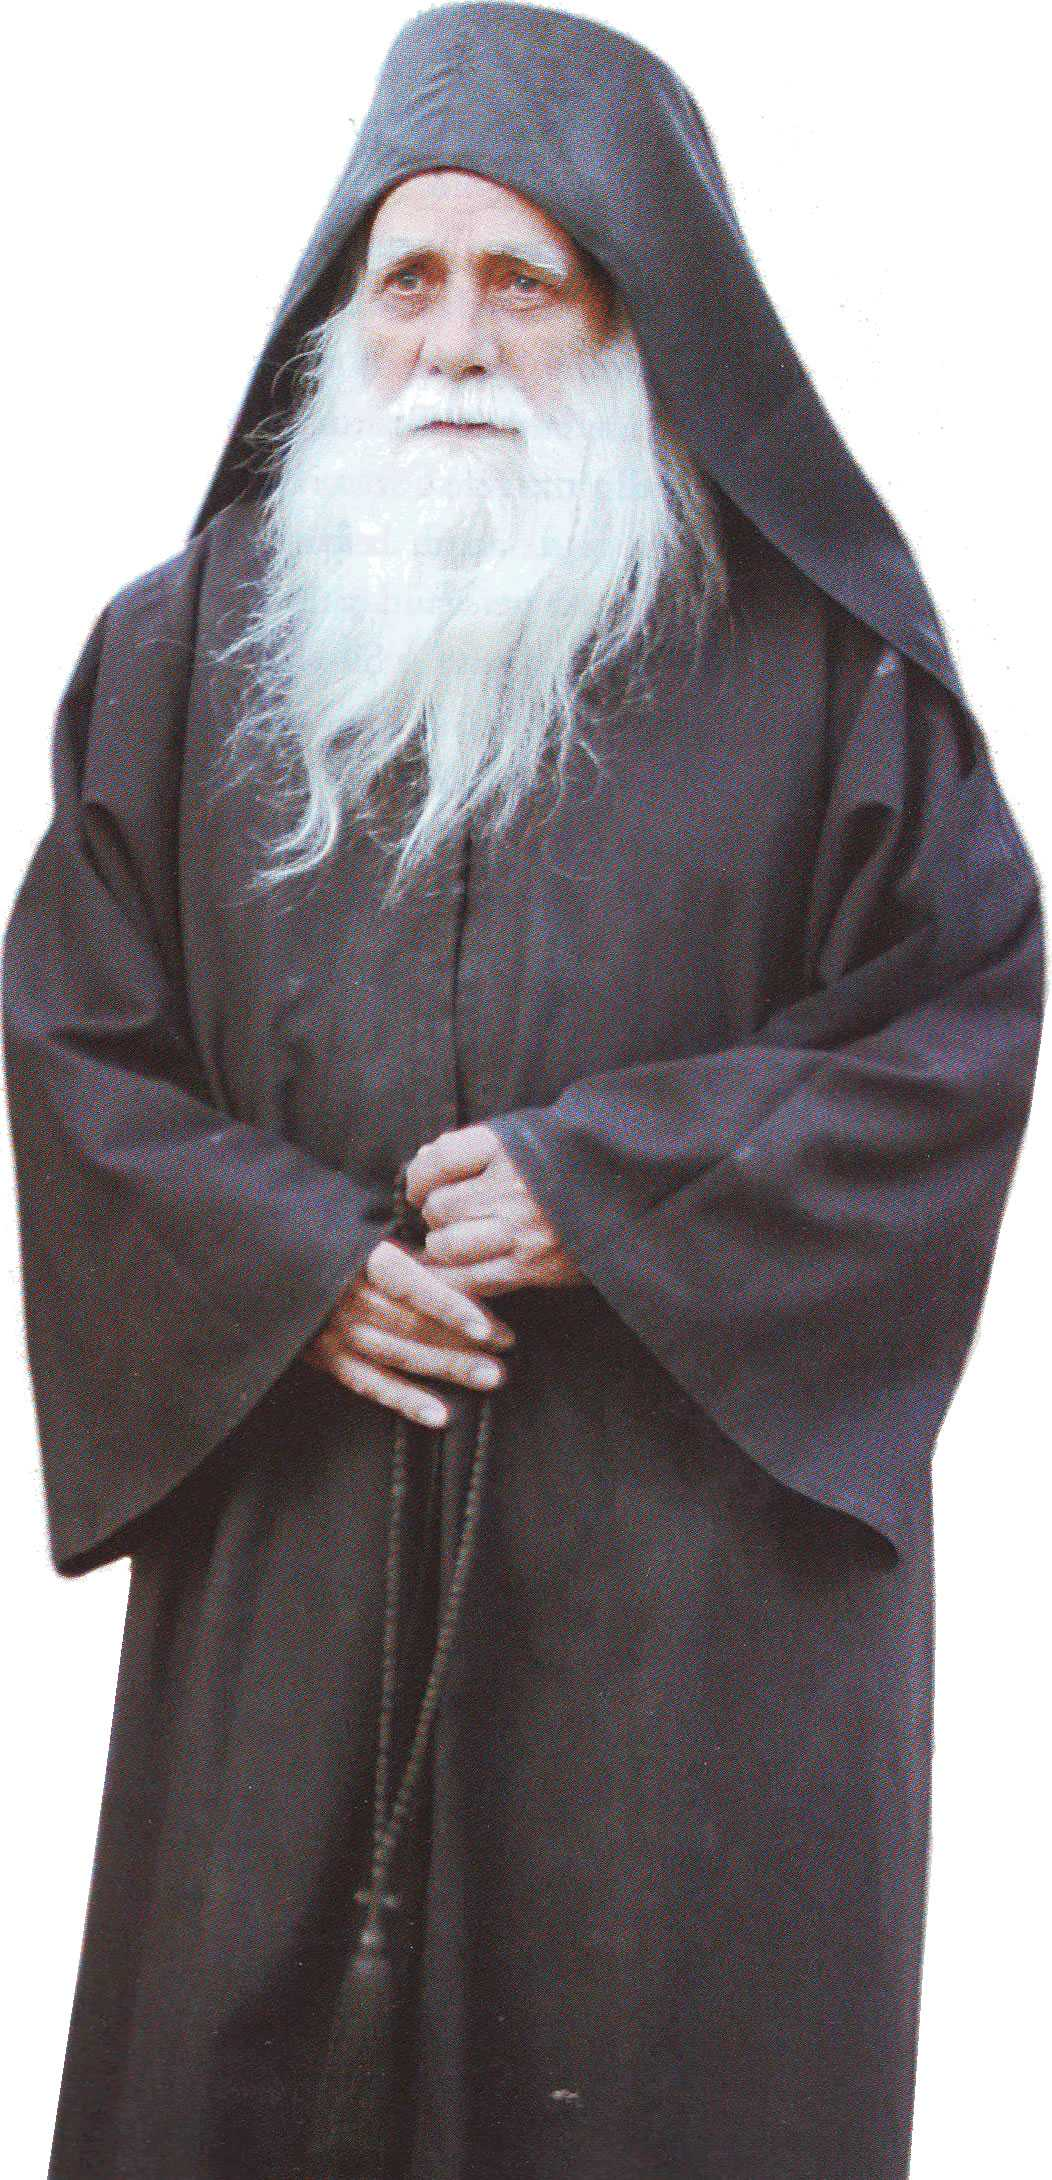 "AVVA IULIAN LAZAR, duhovnicul schitului Prodromu: <i>&#8220;Multumescu-ti Tie, Doamne, ca-mi ingadui sa vorbesc cu Tine!""</i>"